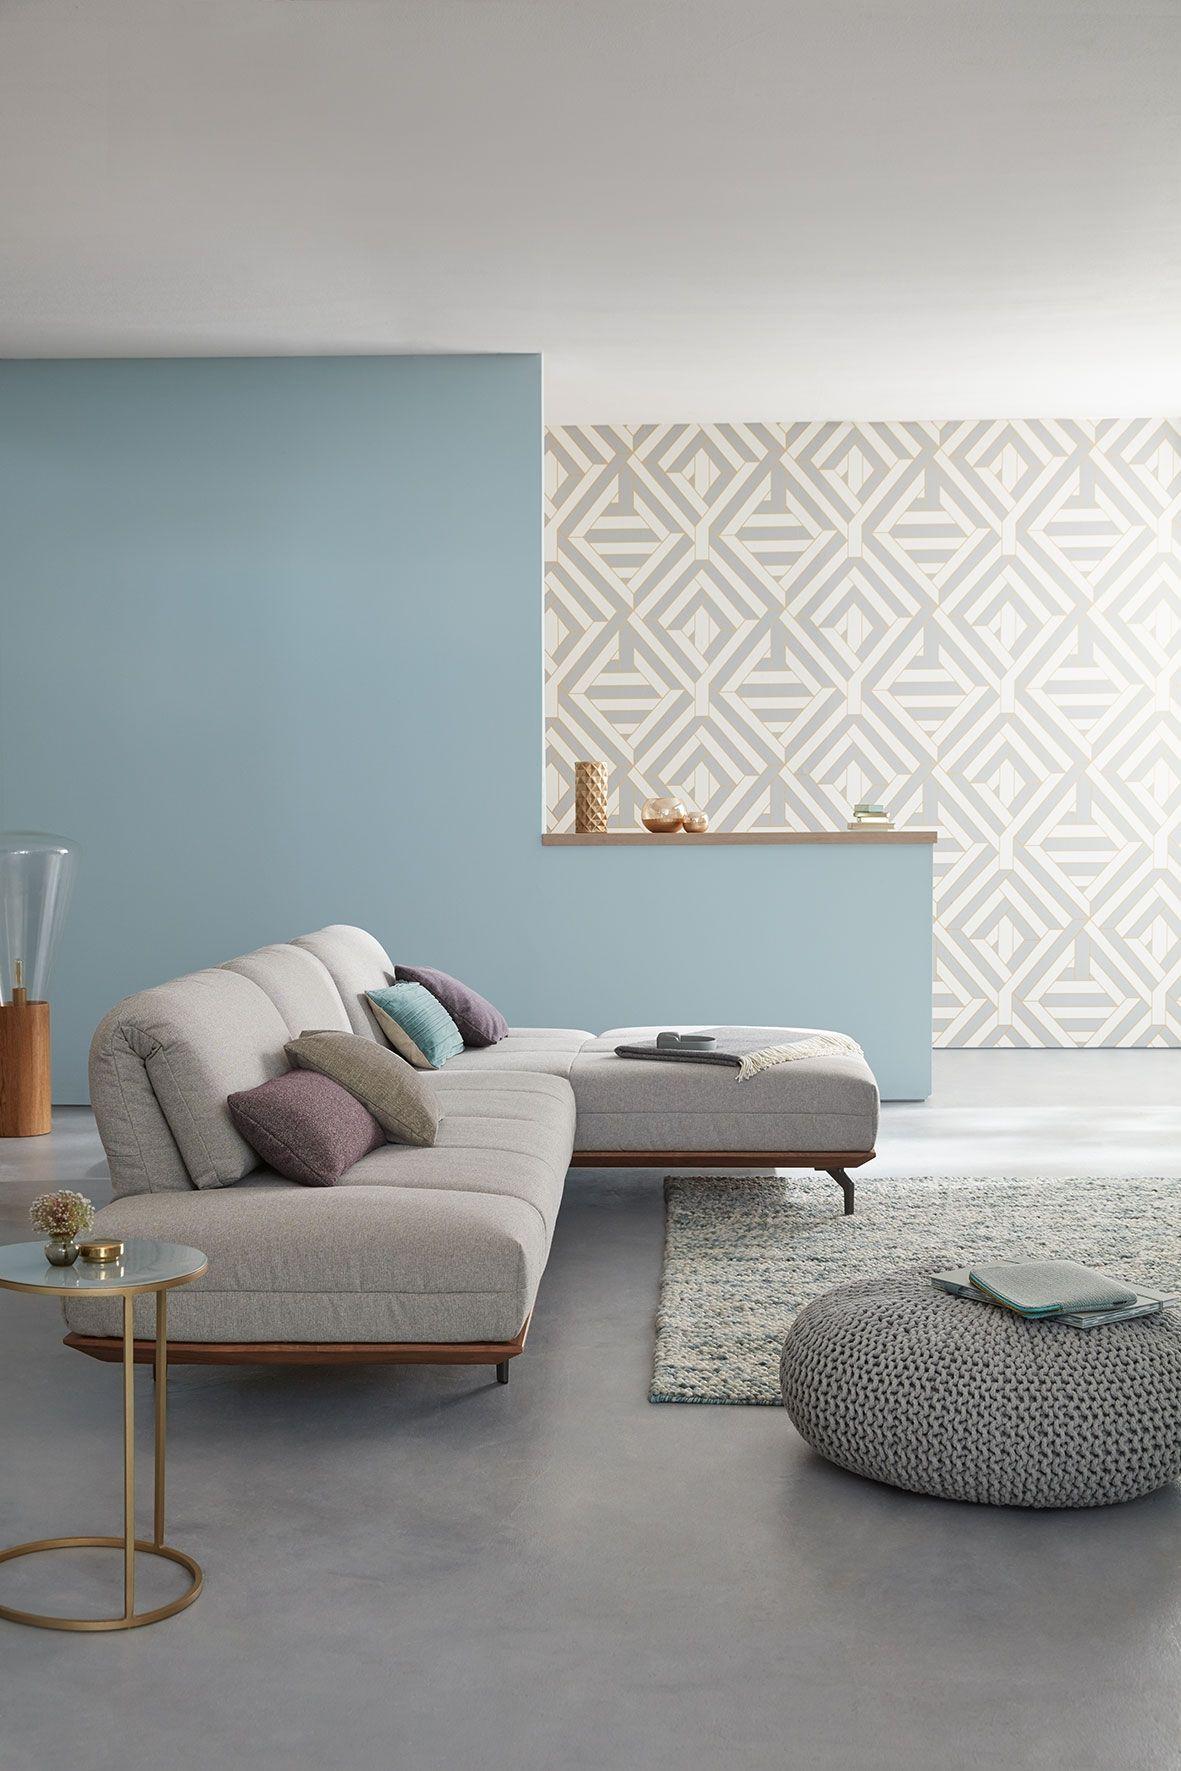 hlsta sofa garnitur awesome rolf benz cara sofa mit funktionen und kissen in stoff weinrot with. Black Bedroom Furniture Sets. Home Design Ideas